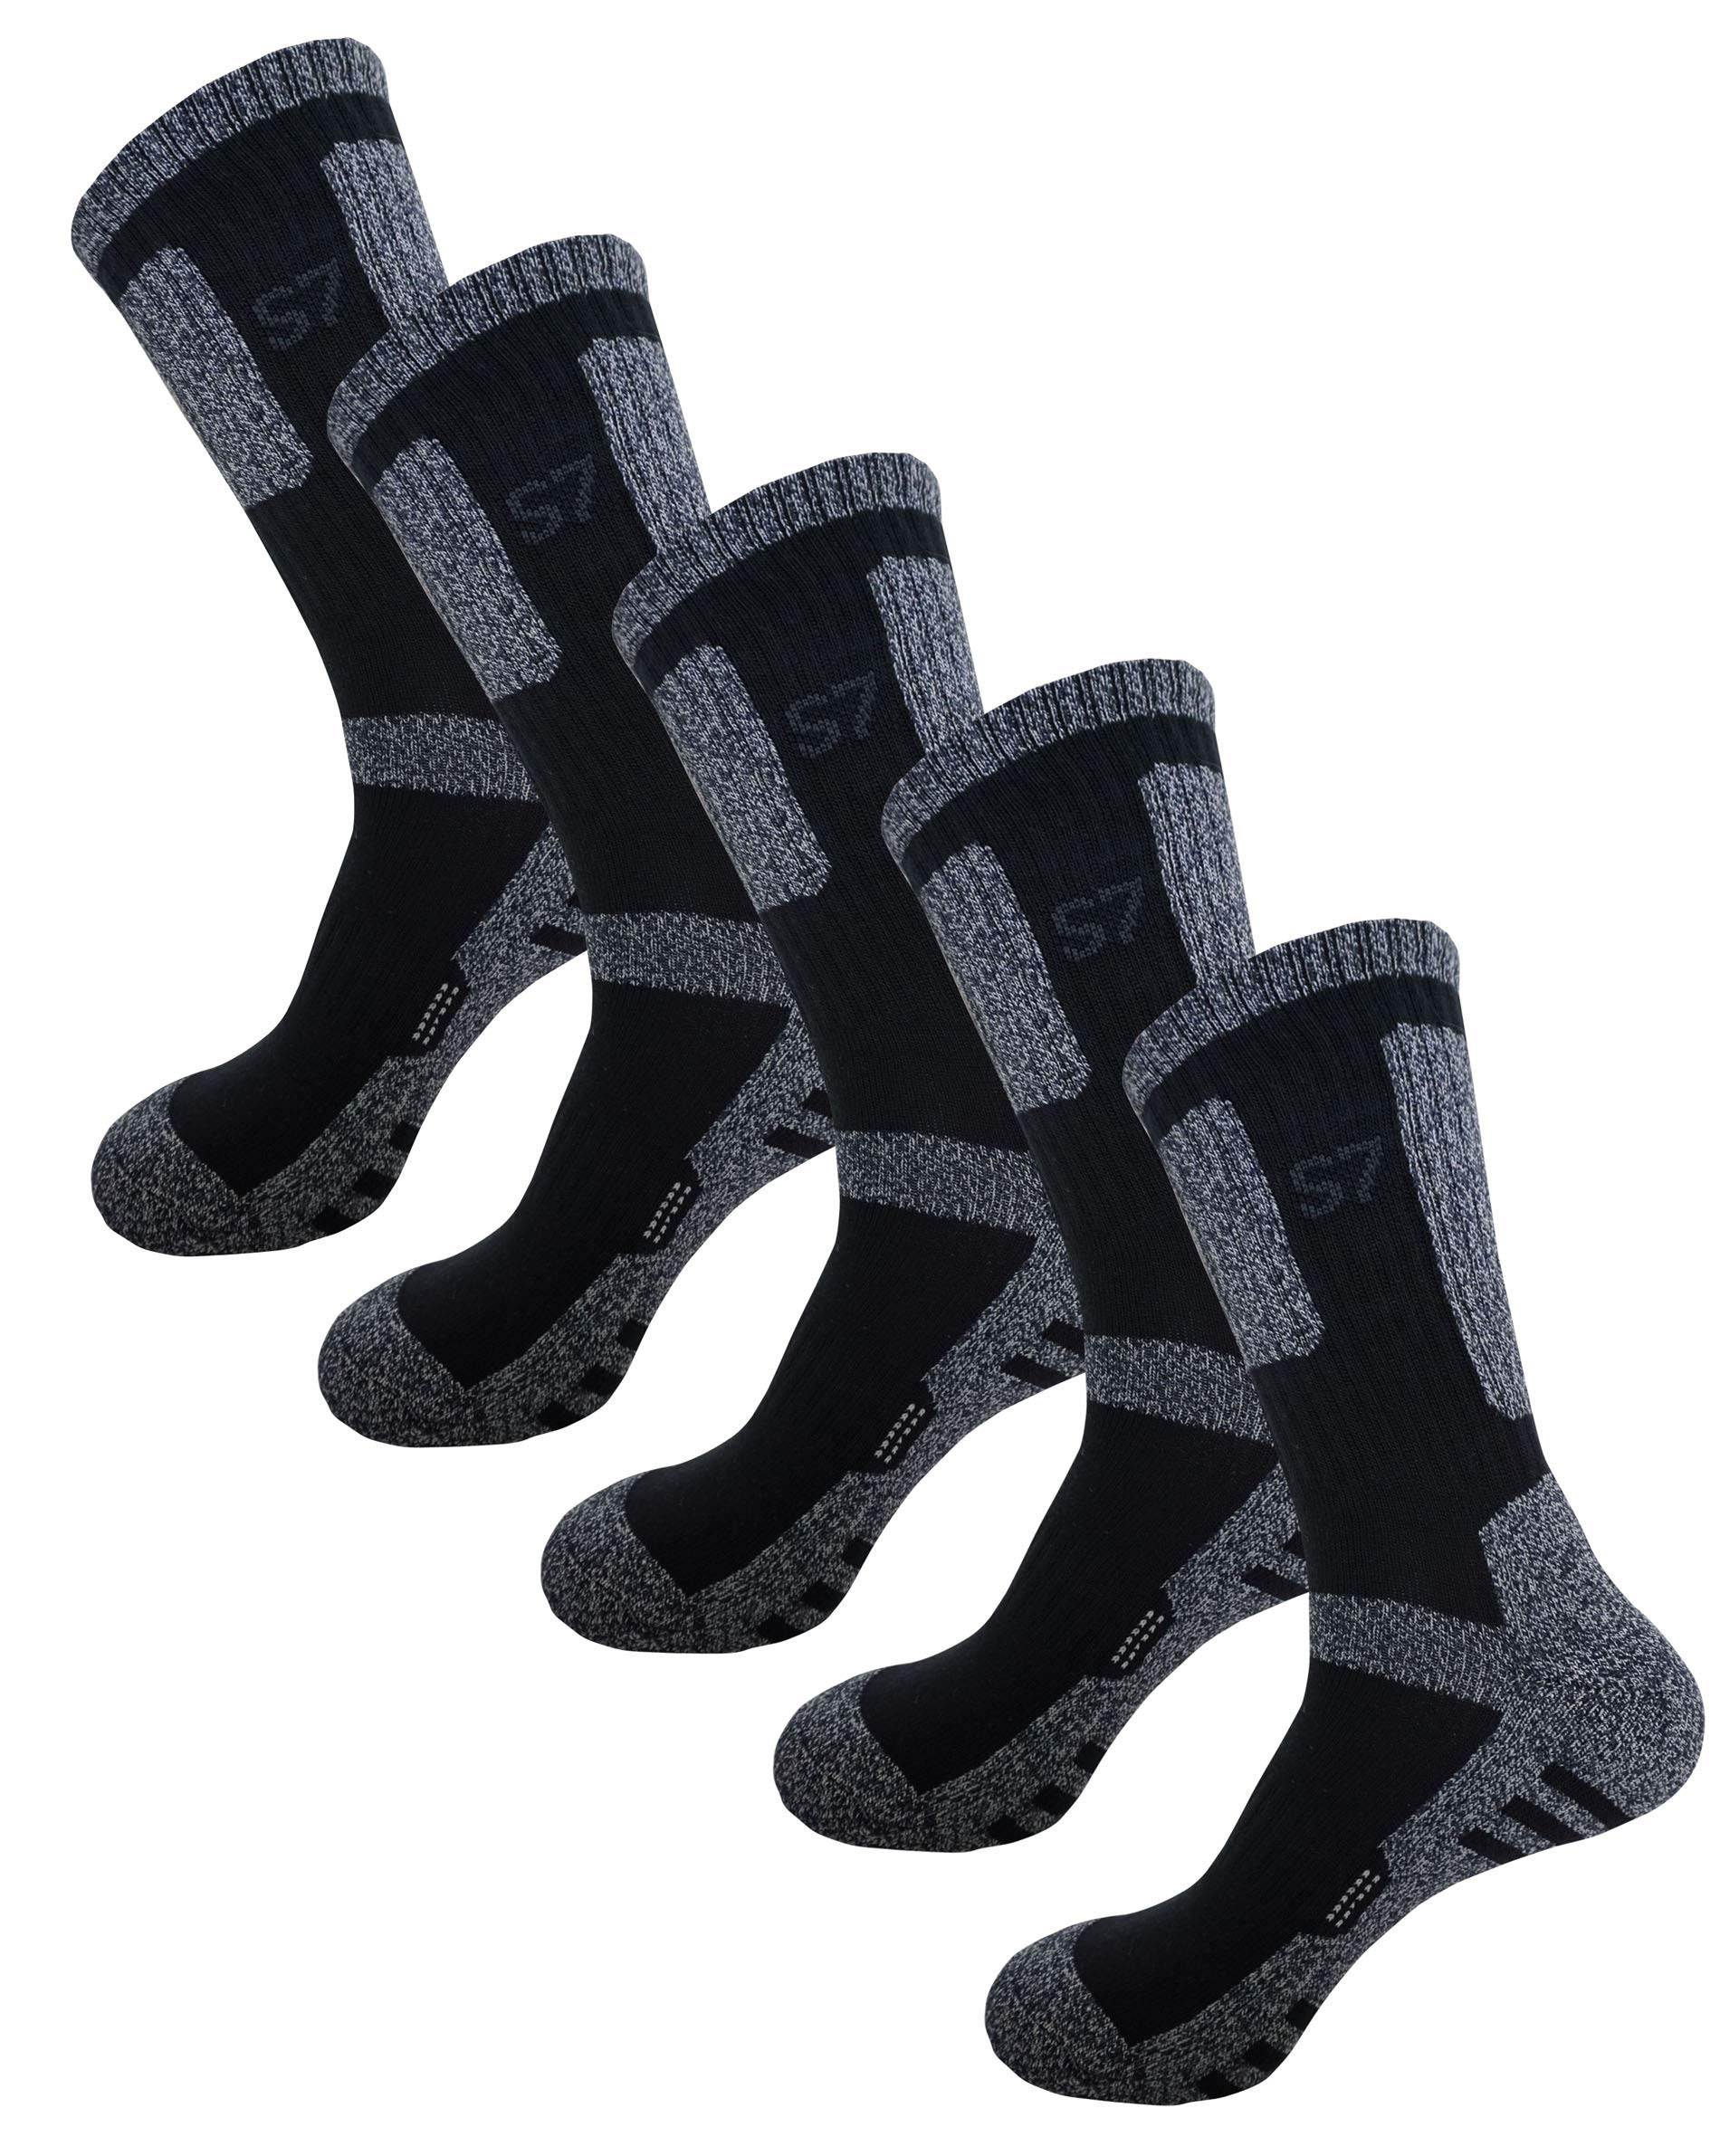 SEOULSTORY7 5Pack Men's Climbing DryCool Cushion Hiking/Performance Crew Socks 5Pair Black XL by SEOULSTORY7